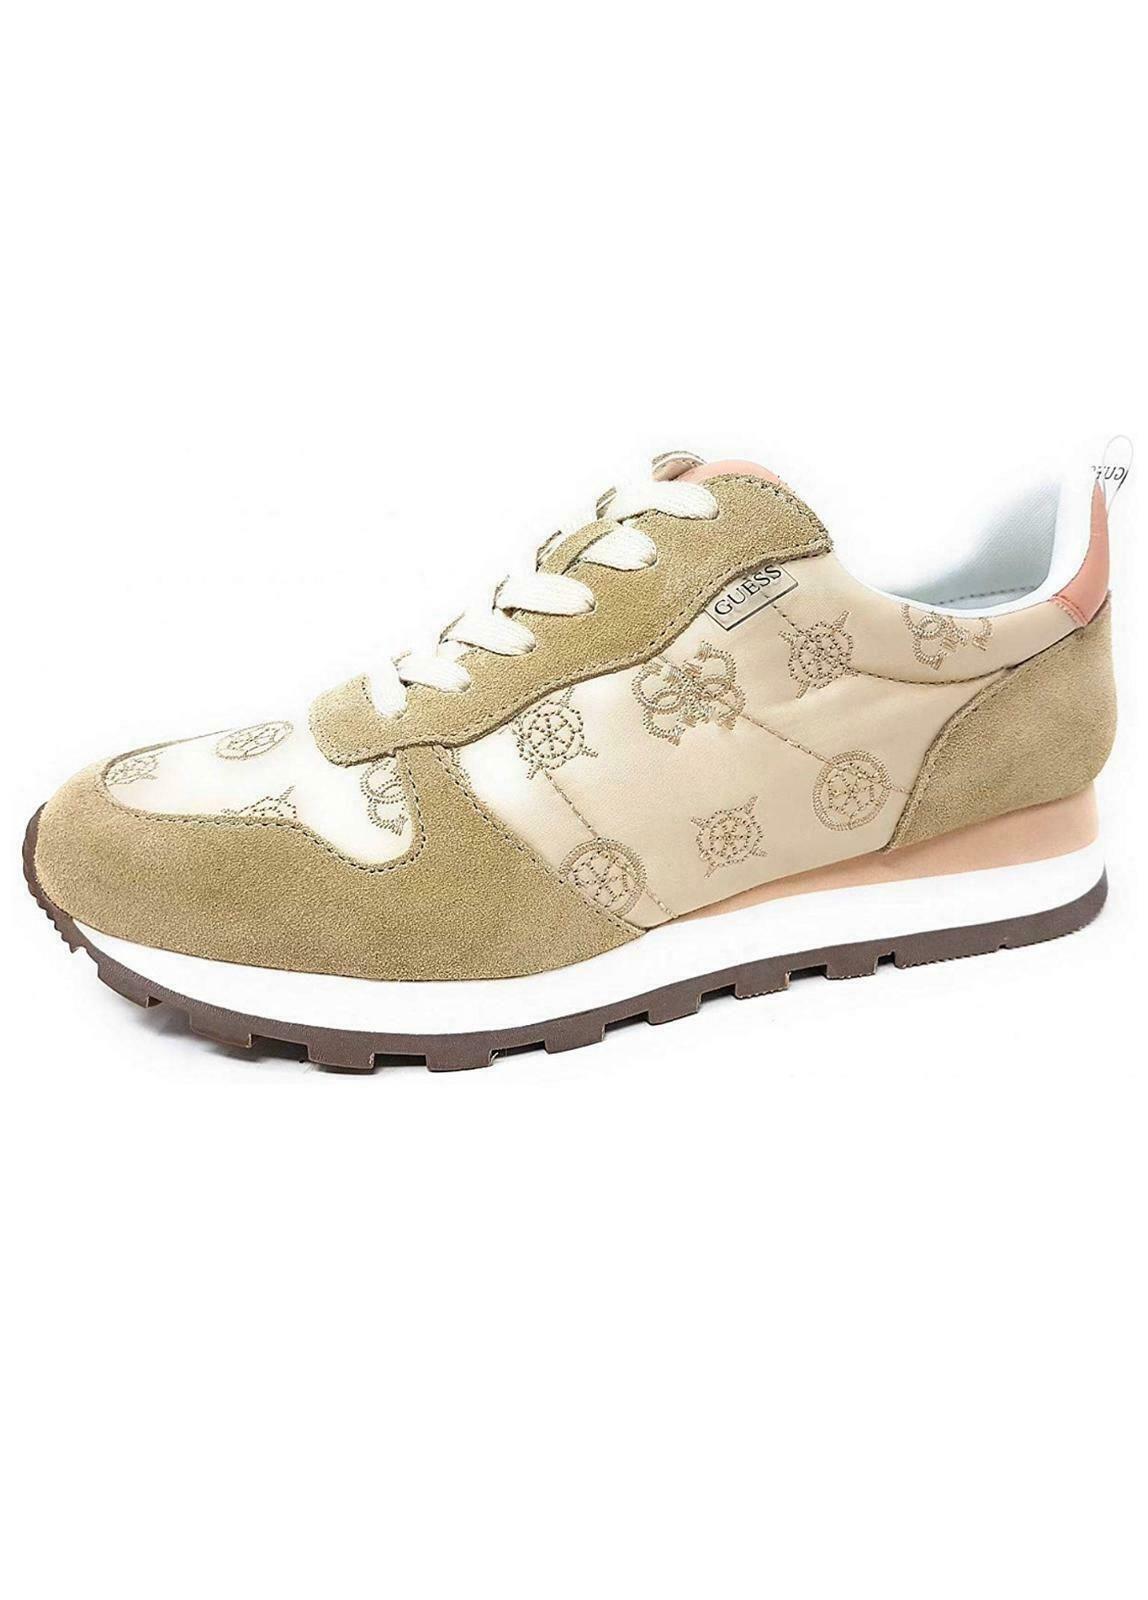 puma scarpe donna panna